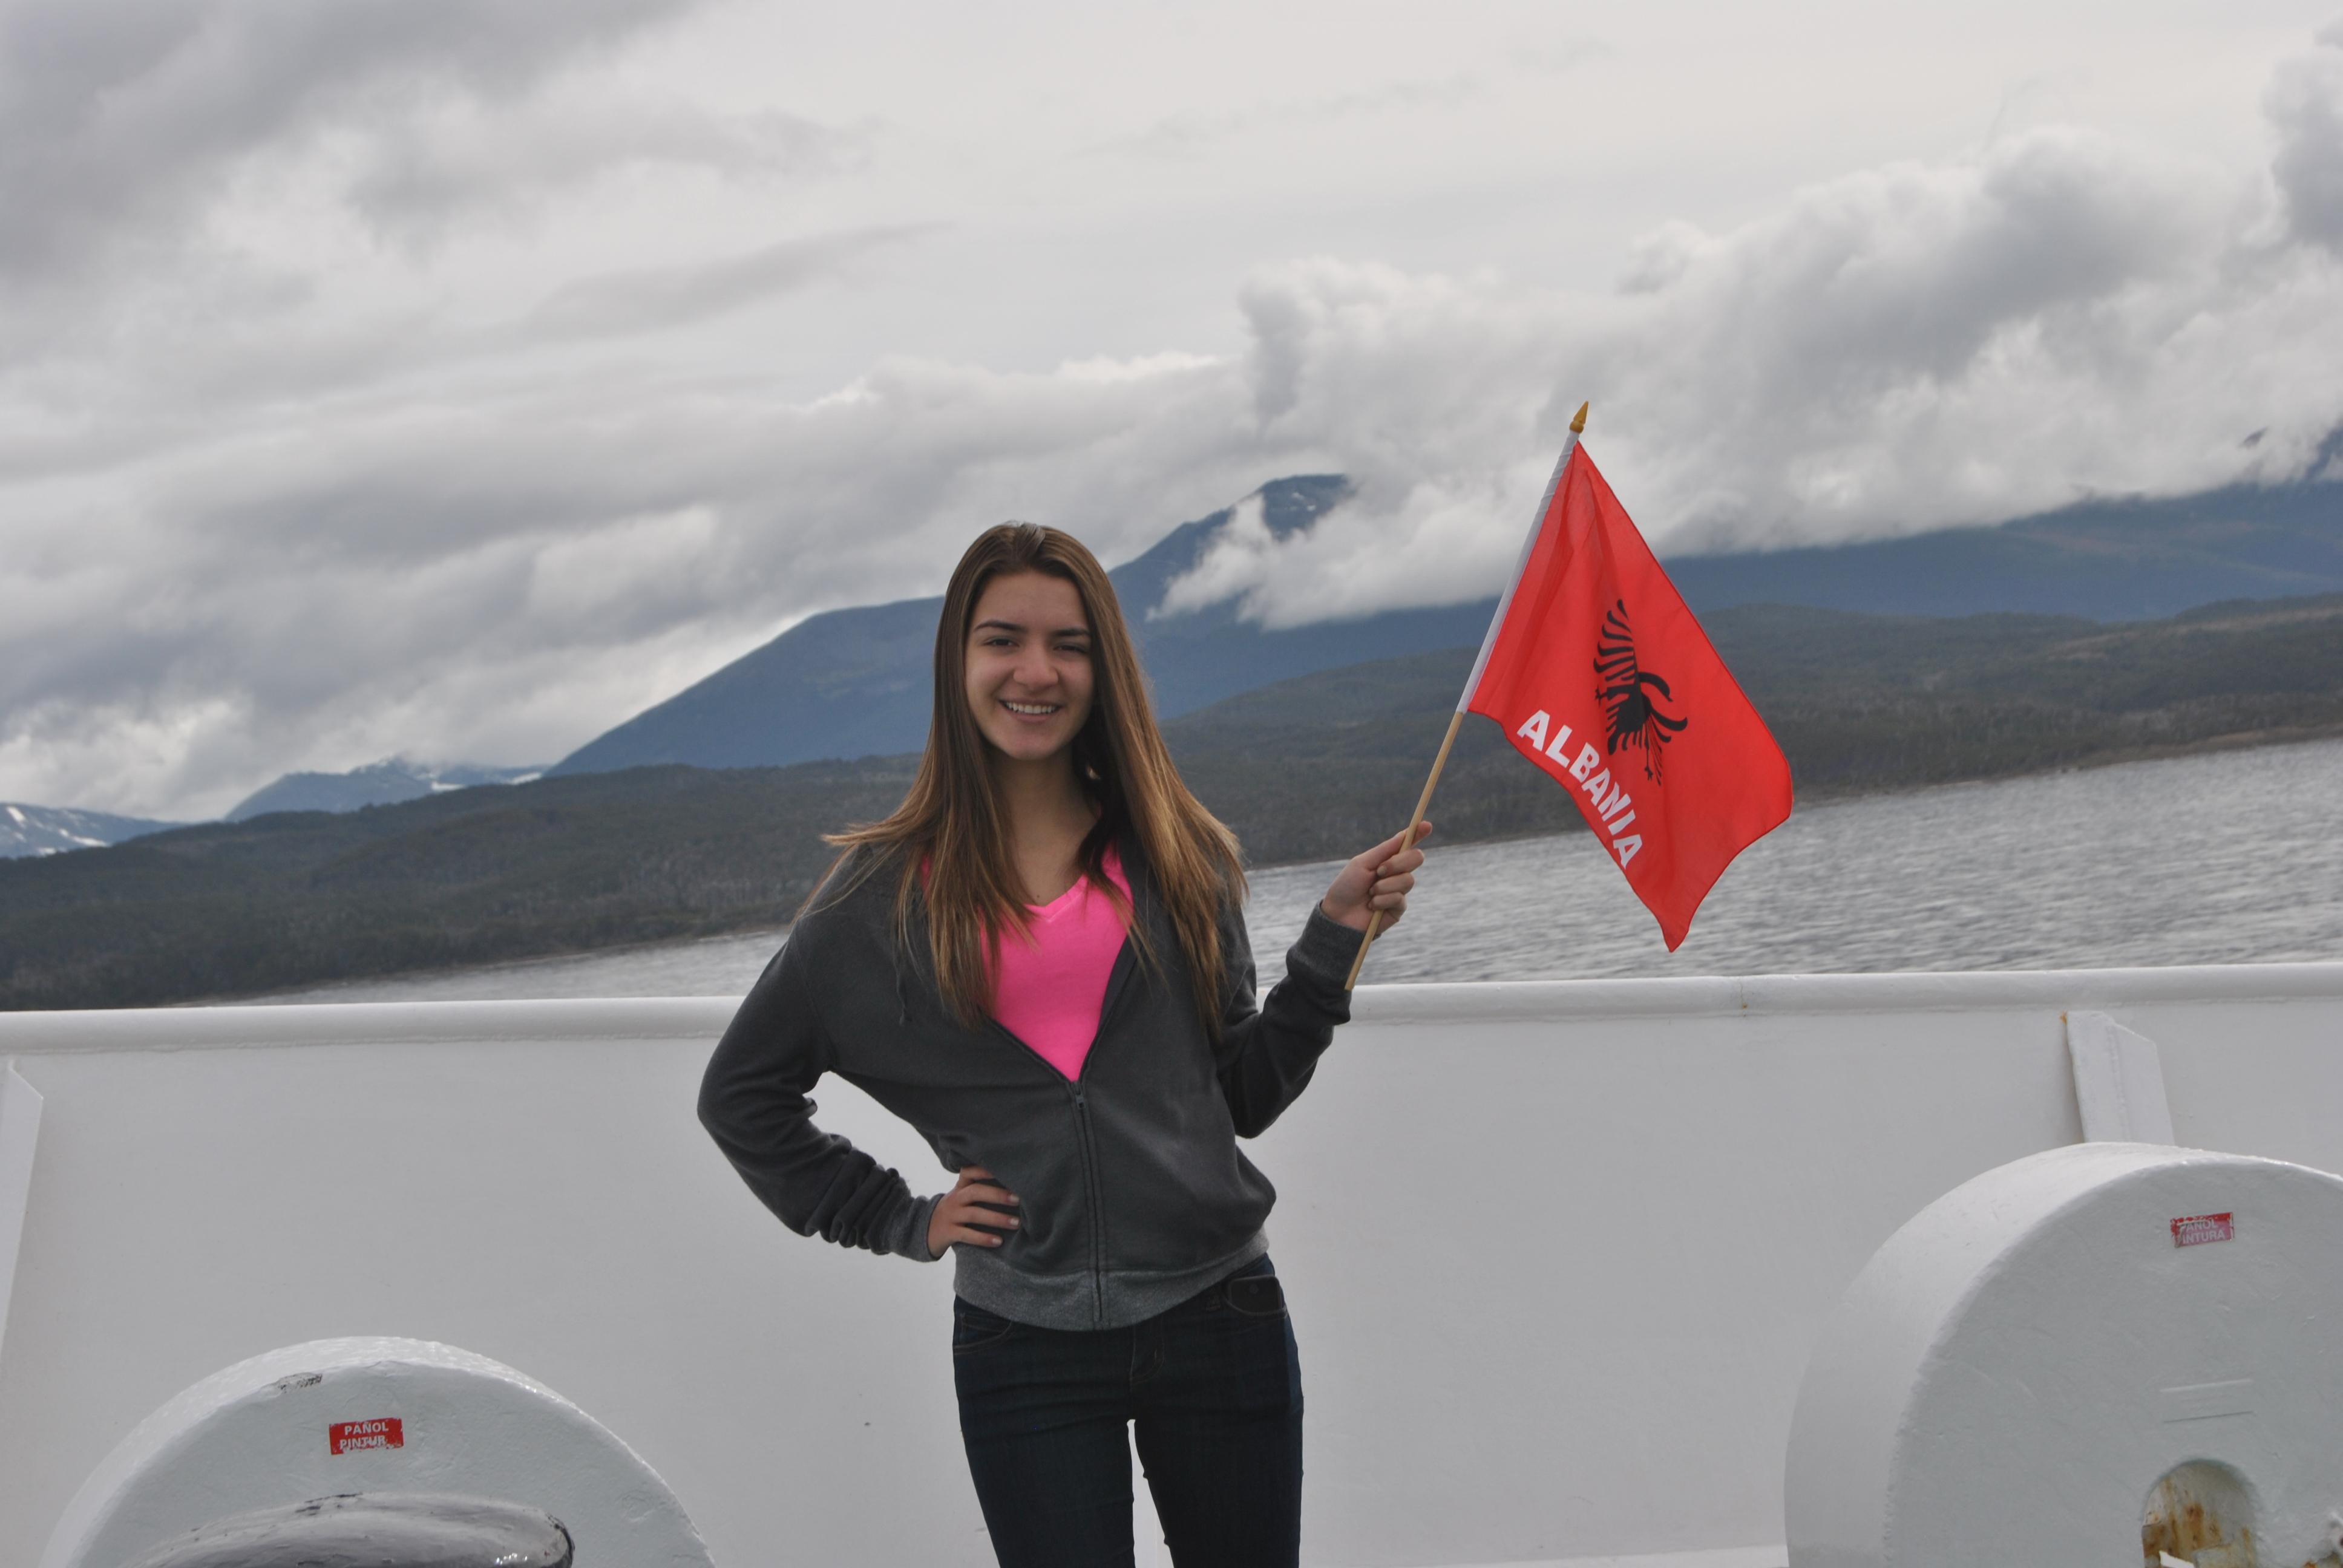 Staten Island University >> Studentija shqiptare Atdhetare Ame, vendos flamurin ...